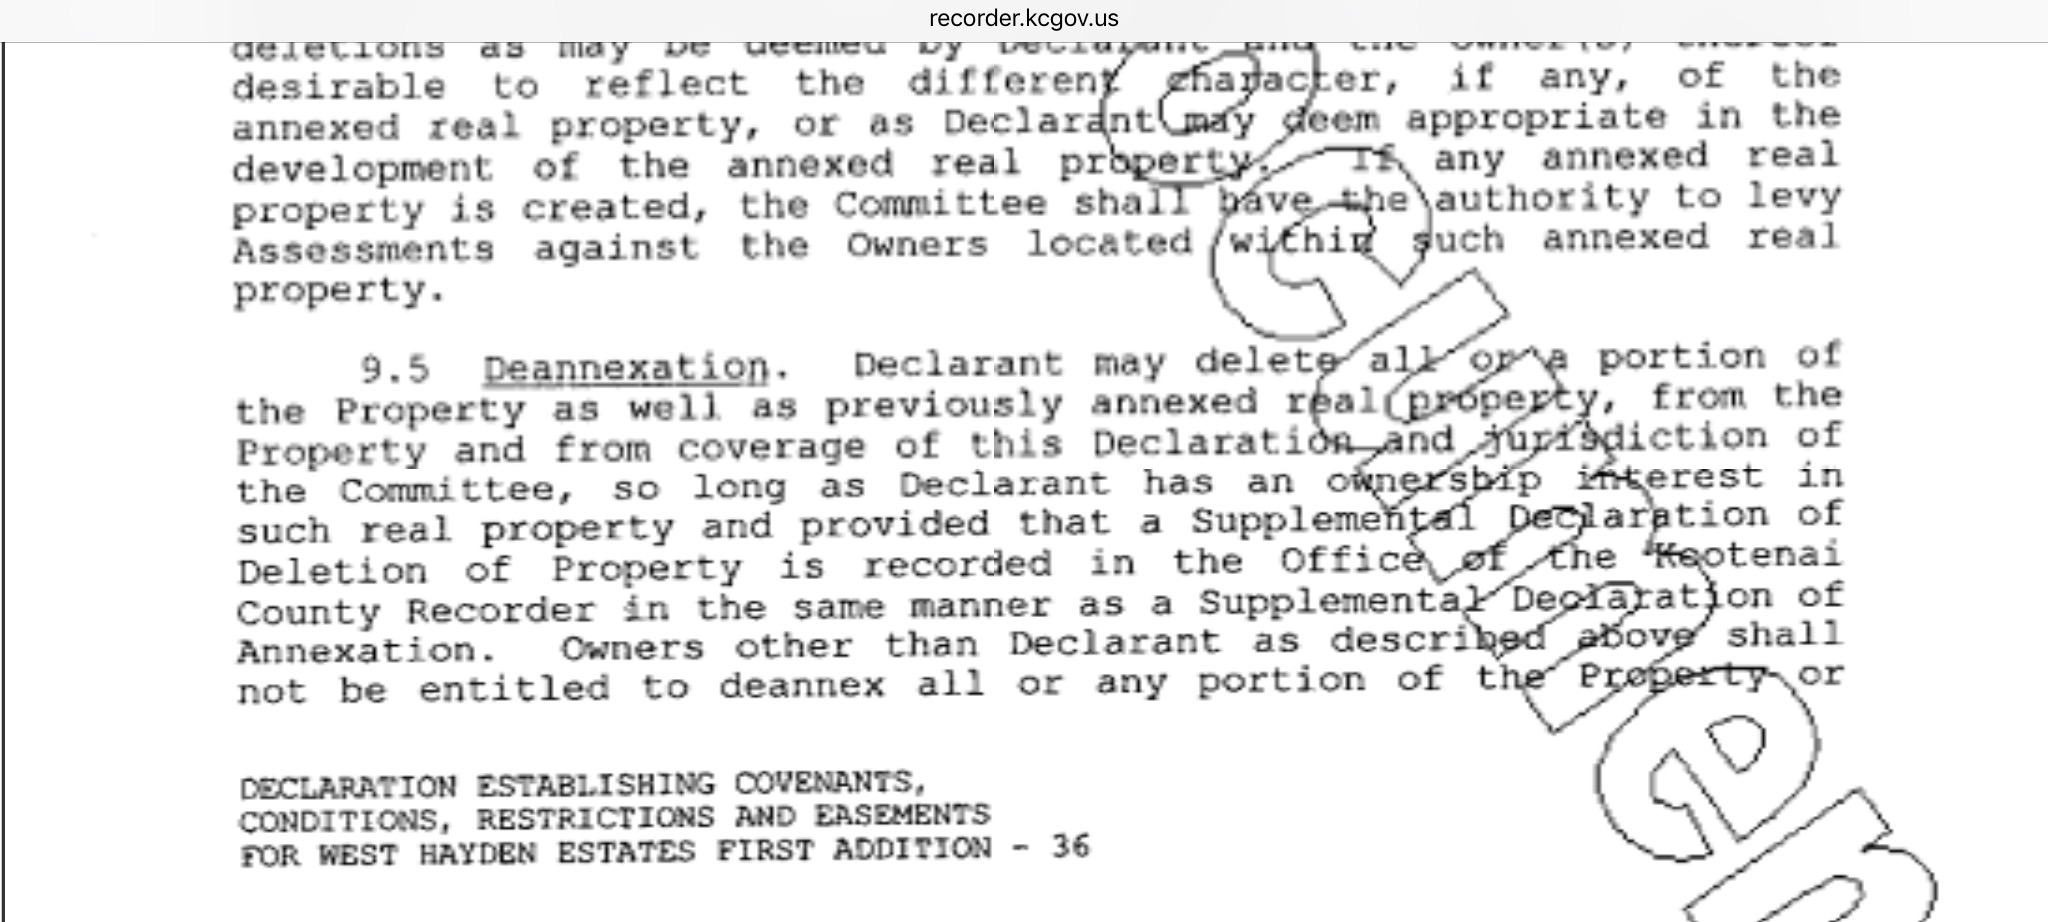 Homeowner Attorney Files Fair Housing Lawsuit Seeking De